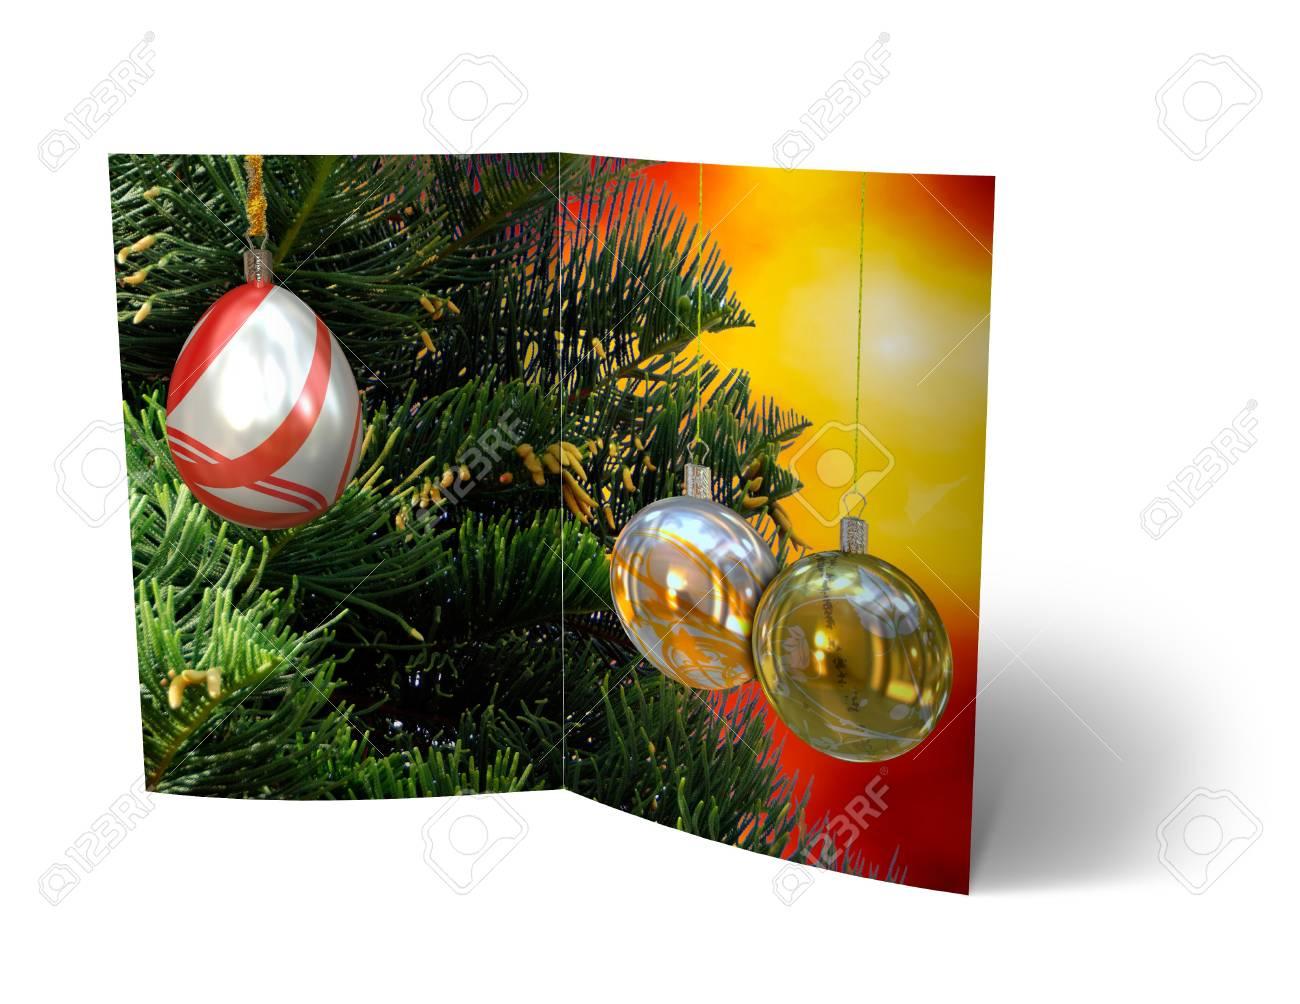 isolated 3d Christmas Balls brochure, Card Illustration Stock Photo - 16023406